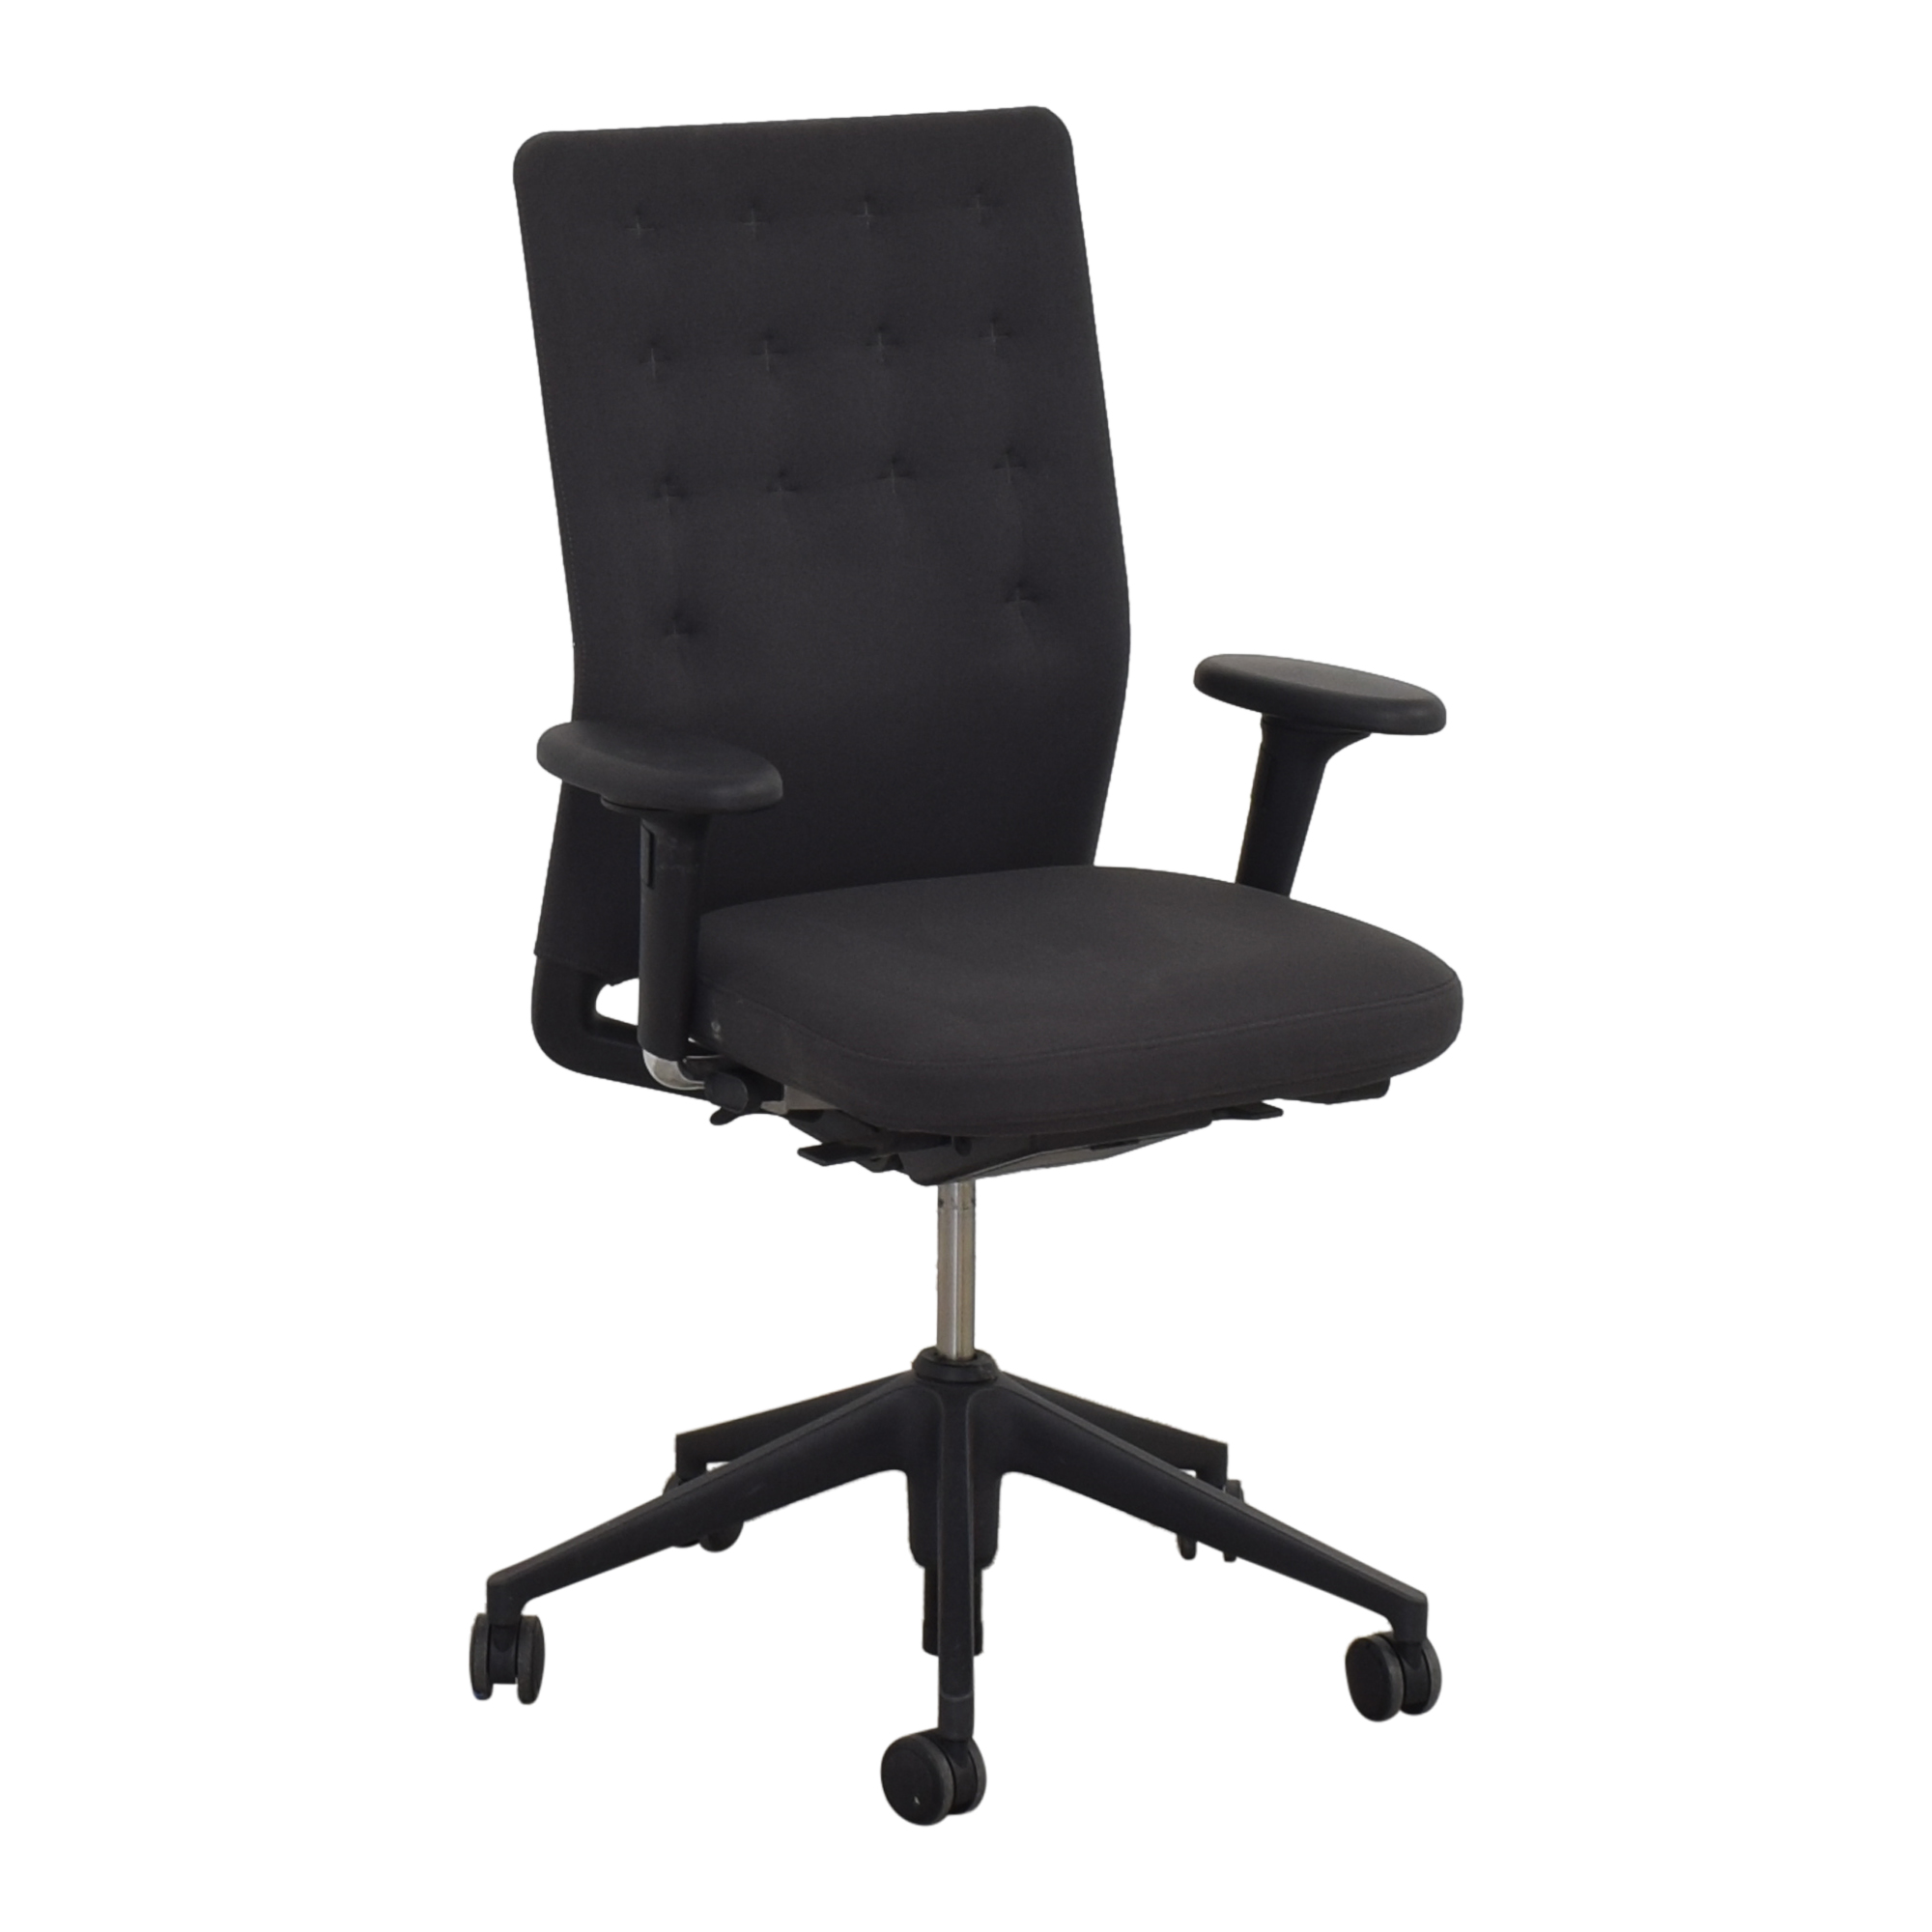 Vitra Vitra ID Trim Office Chair pa